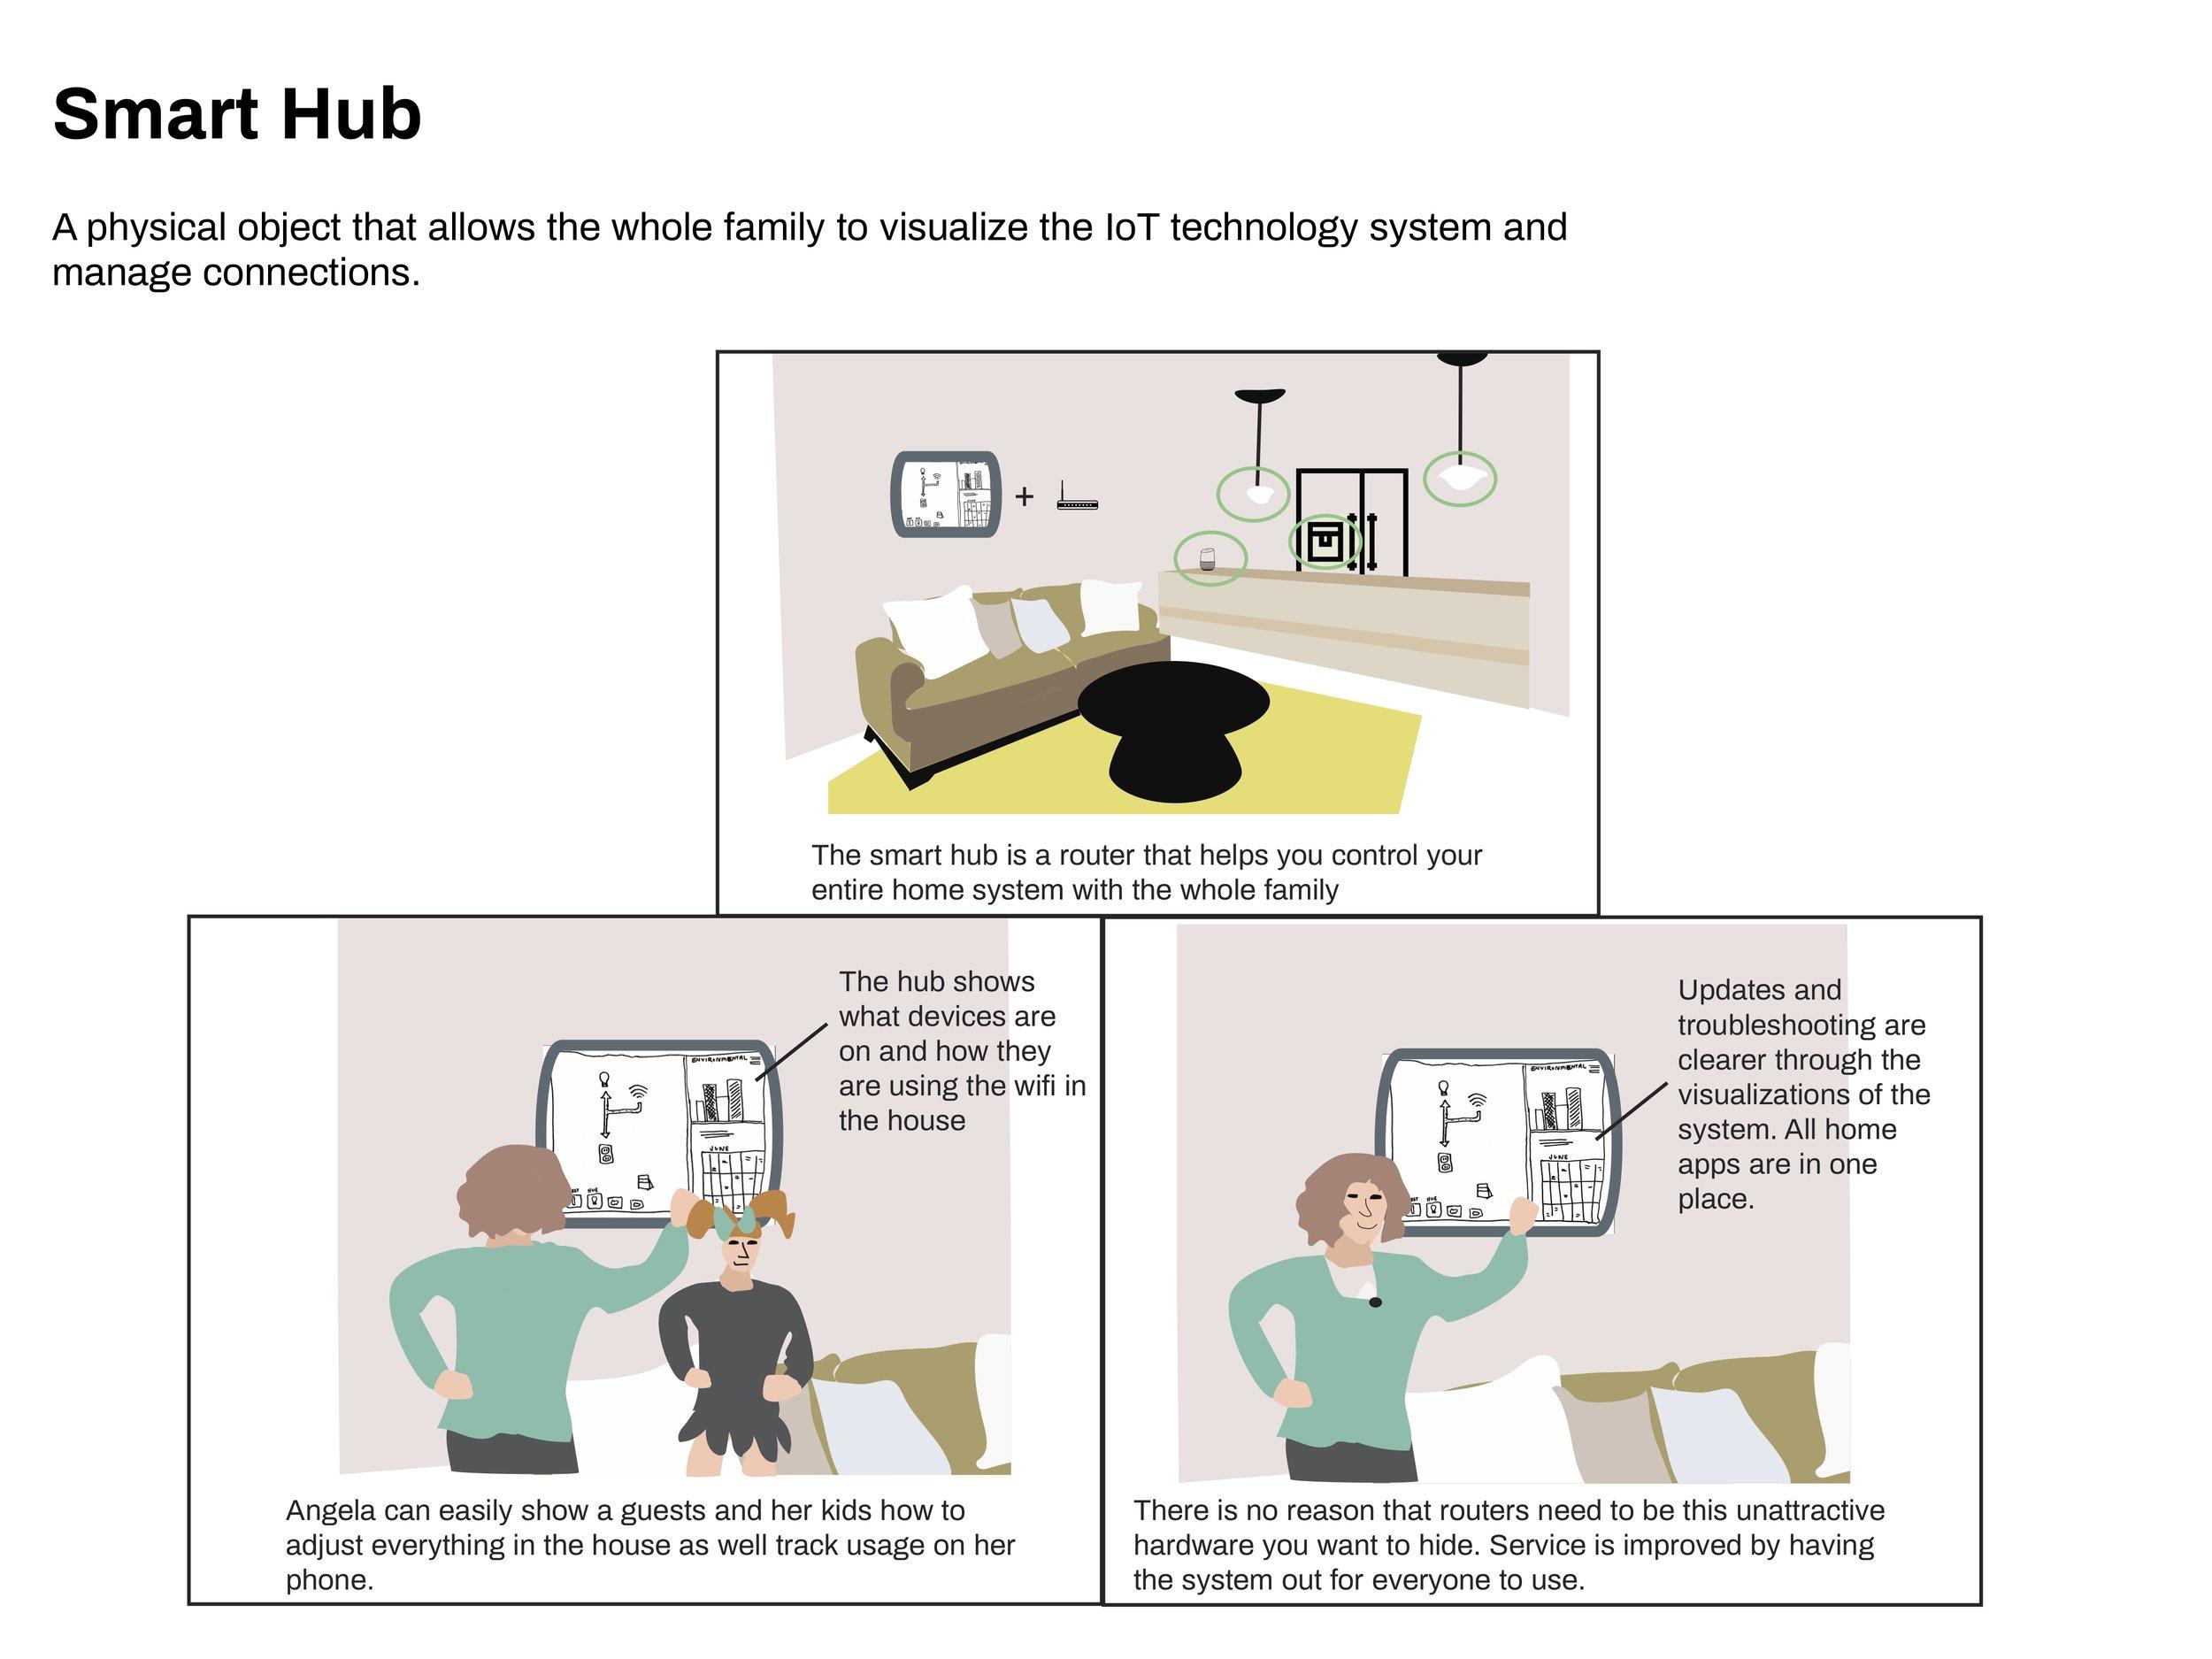 ConceptSuite_626_ForTesting_SmartHub.jpg